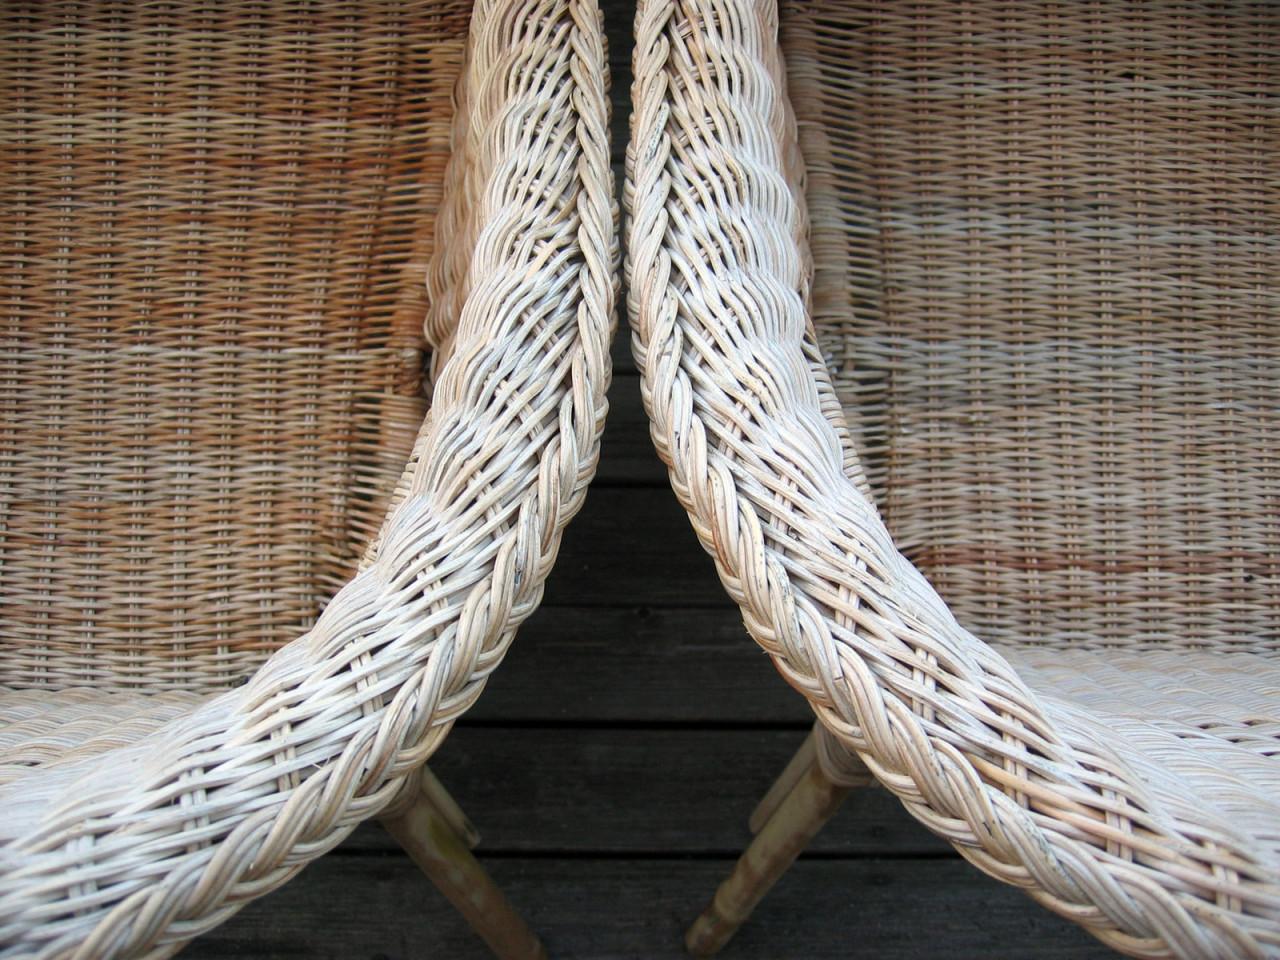 armchairs-1550821-1600x1200